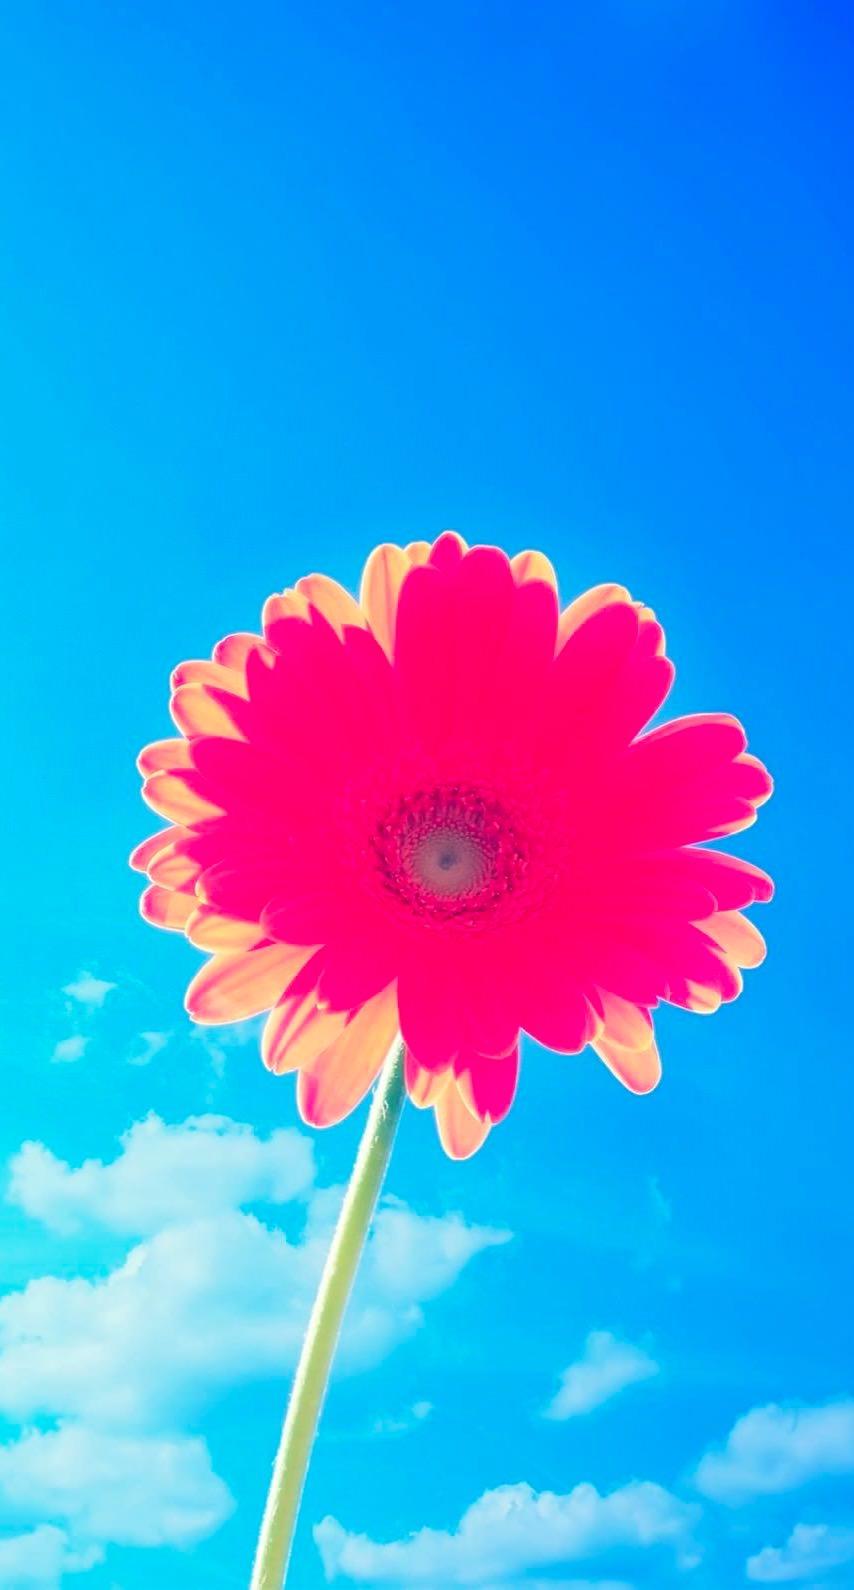 Flower Sky Blue Red Wallpaper Sc Iphone7